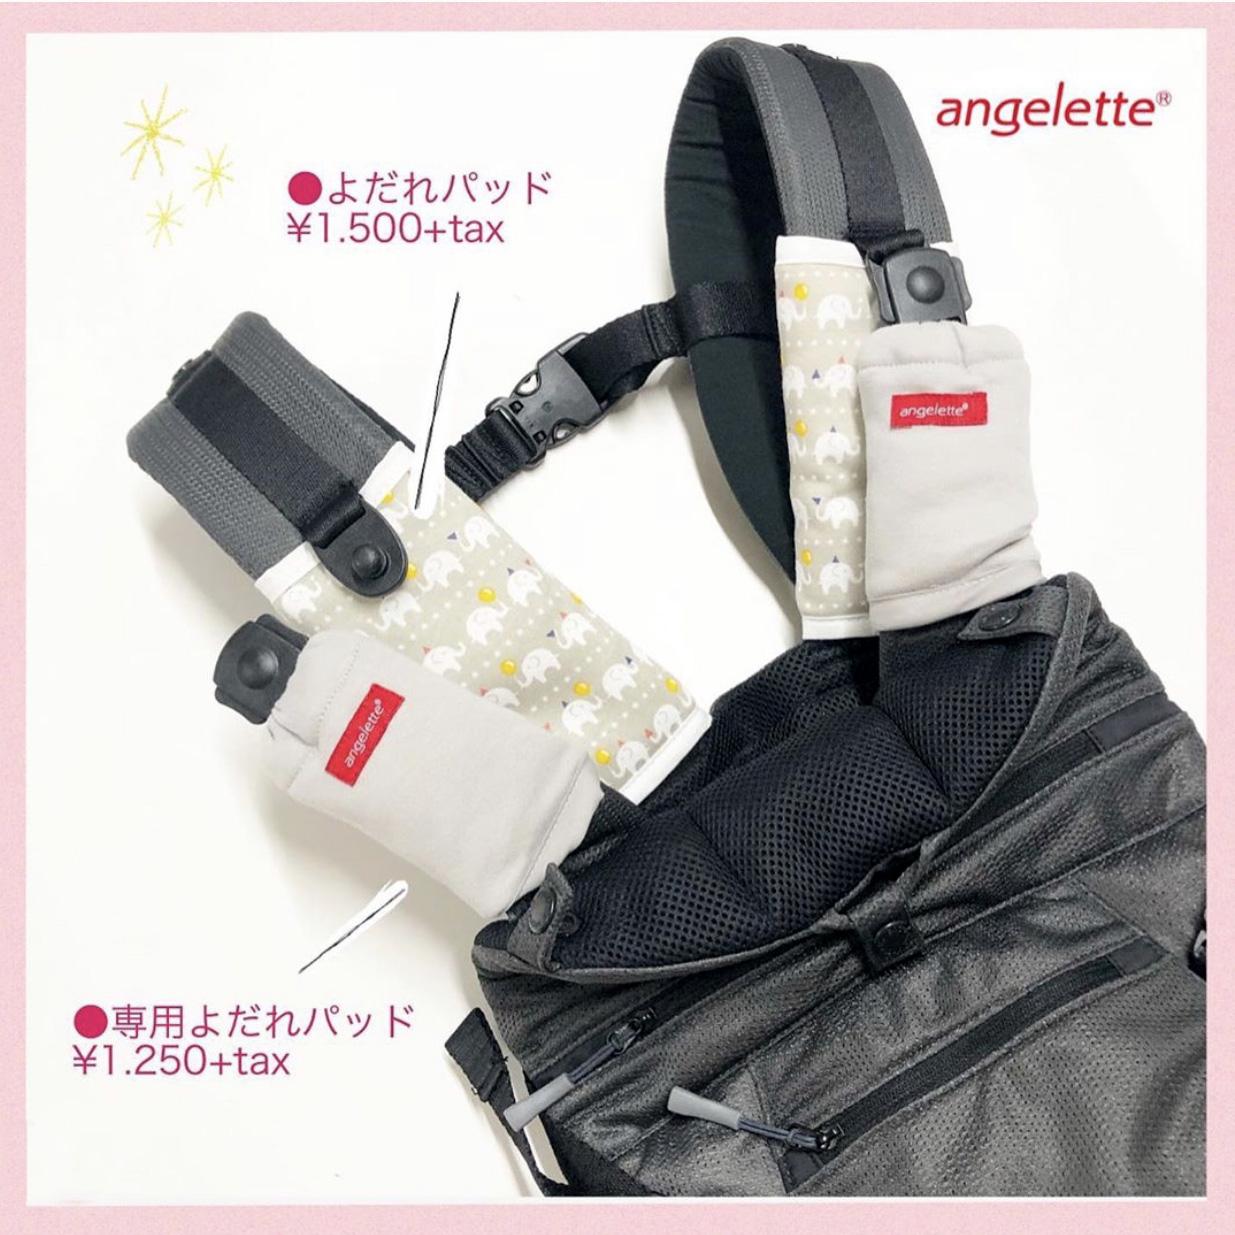 angelette ベビーキャリアオール(抱っこひも)